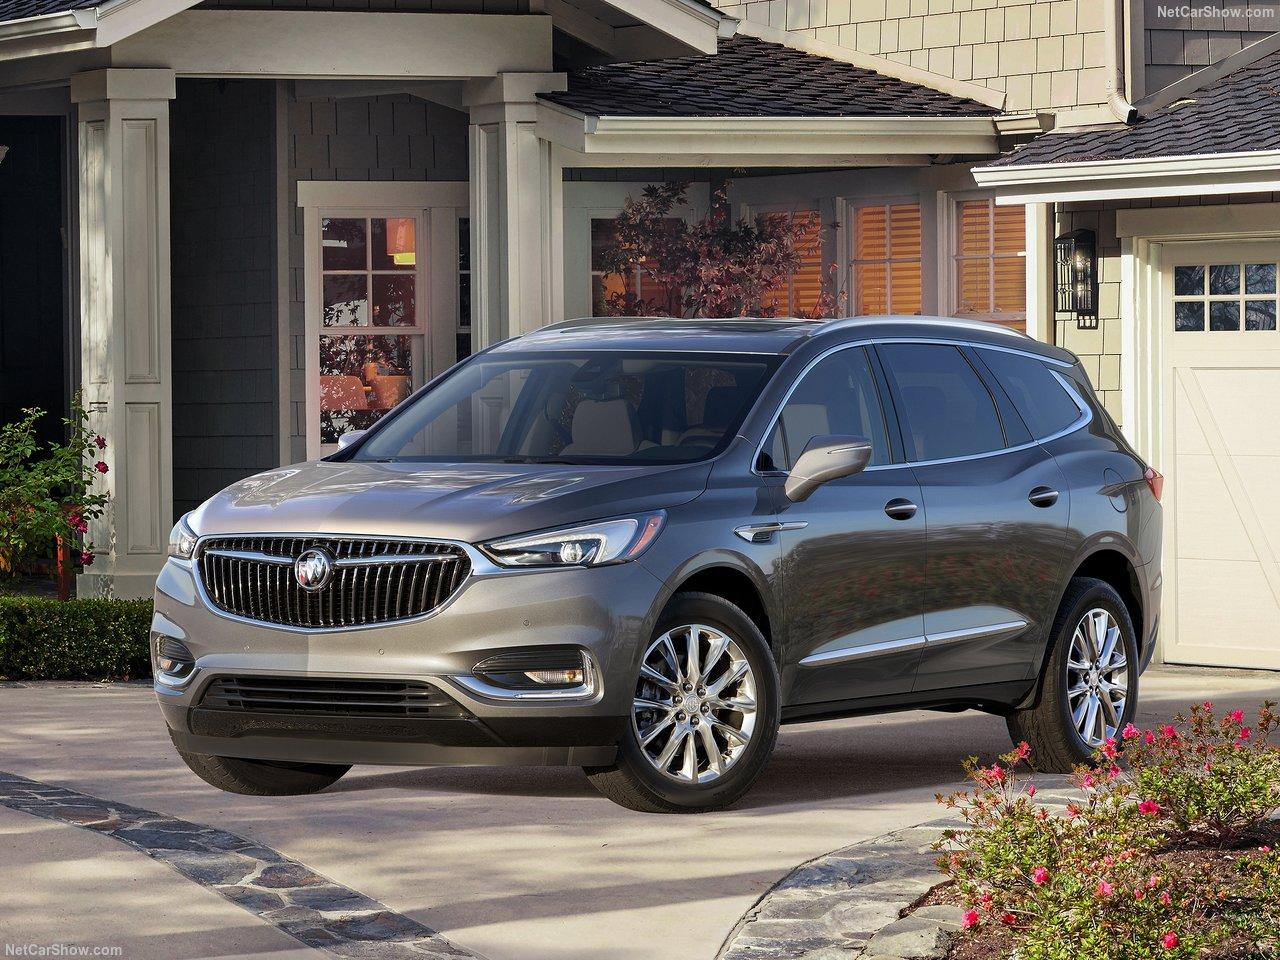 Buick-Enclave-2018-1280-01.jpg